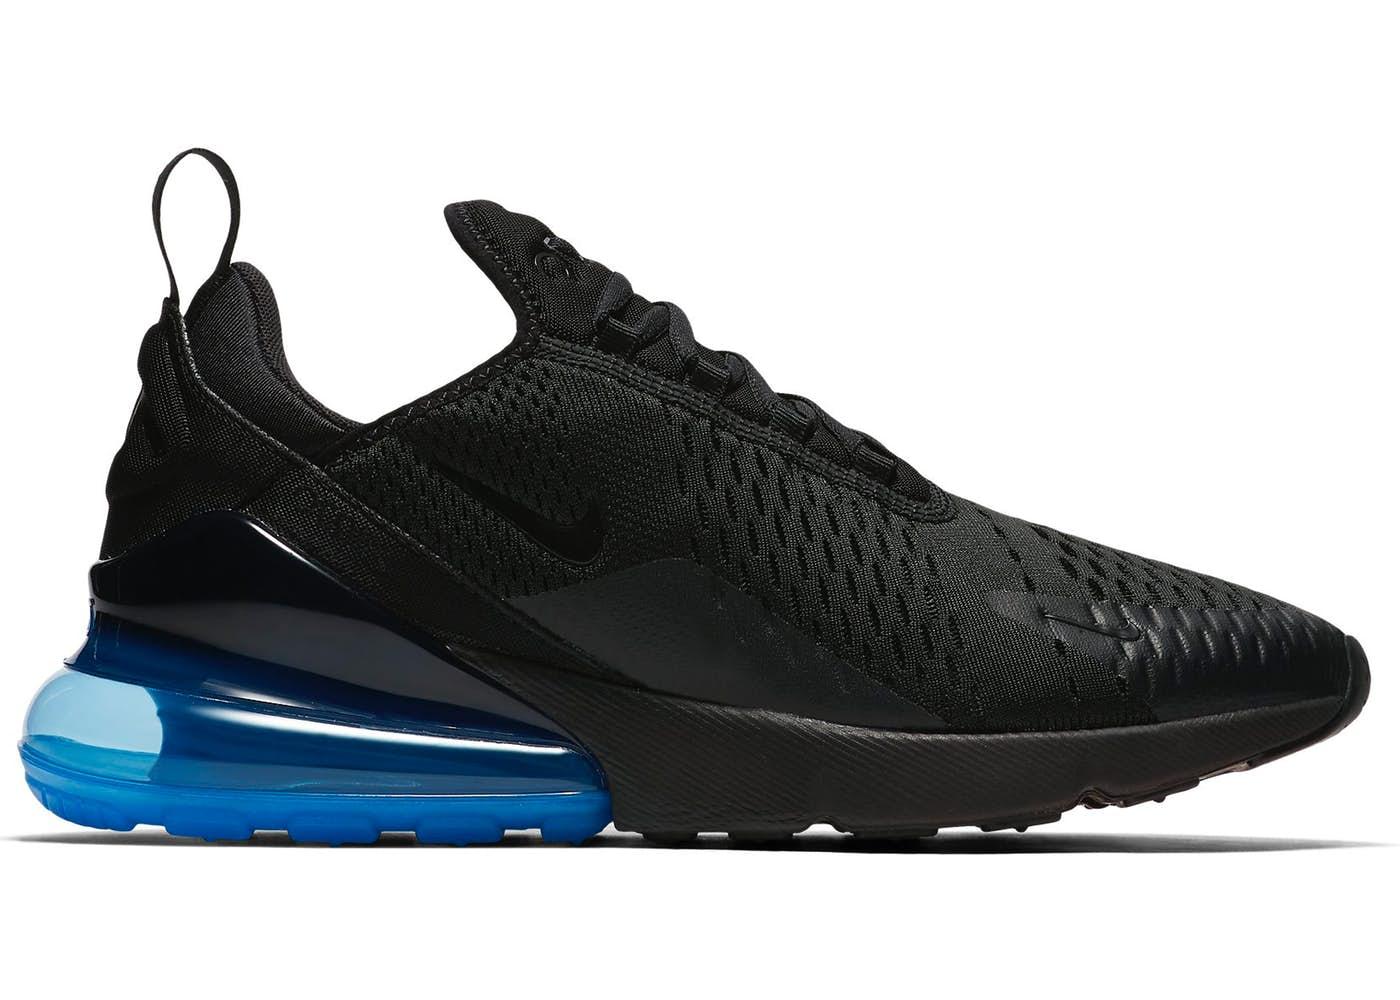 75a29352c243 Кроссовки Nike Air Max 270 Black Blue, интернет-магазин Shoesland.ua